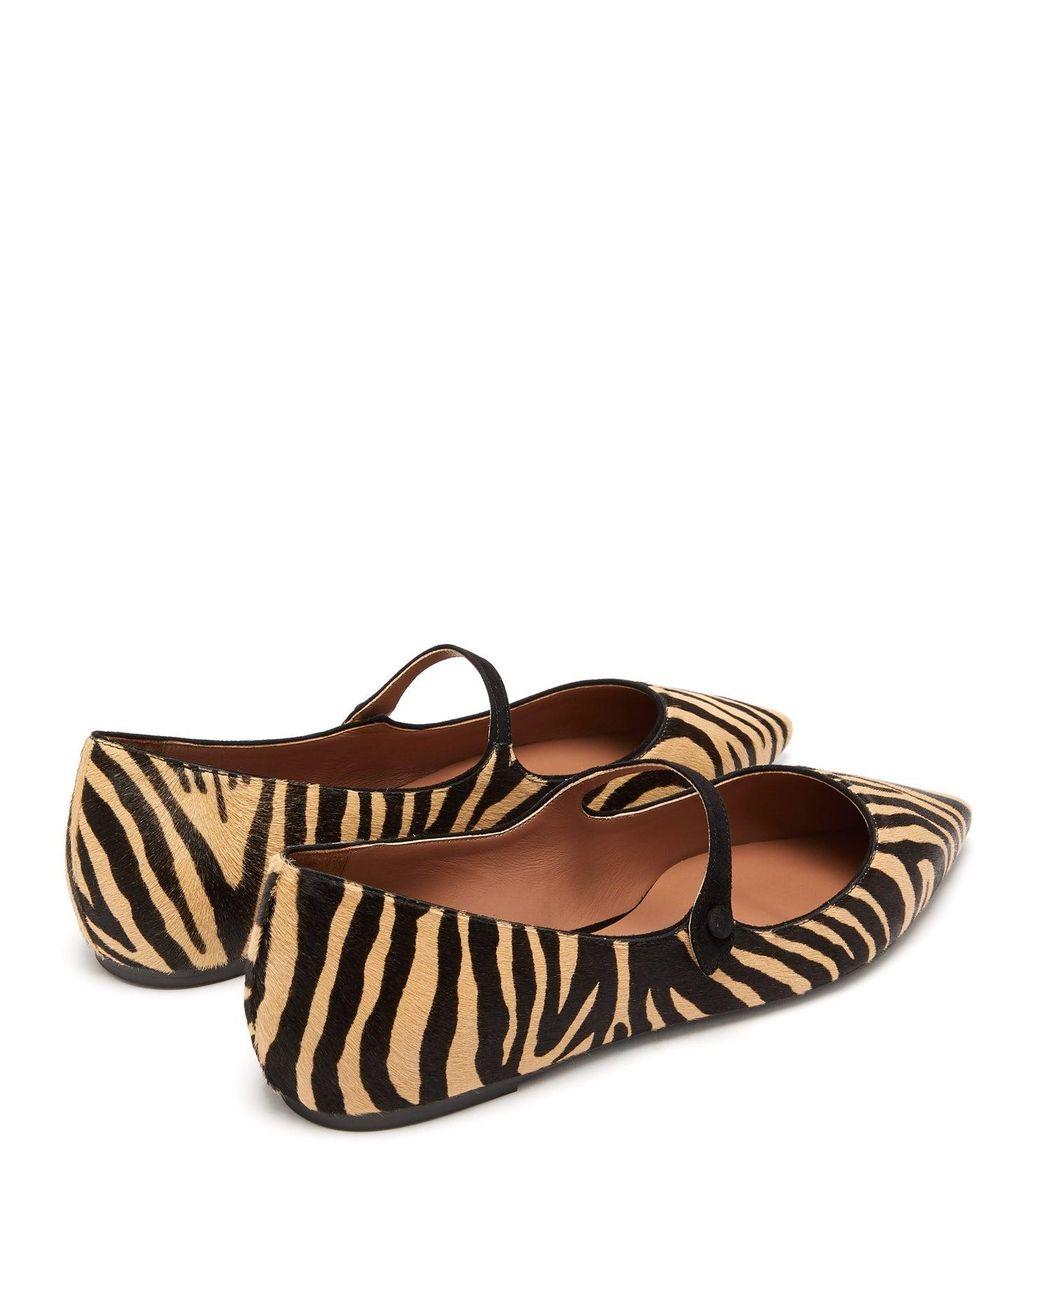 71fa82c4f7a60 Tabitha Simmons Hermione Zebra Print Calf Hair Mary Jane Flats - Lyst